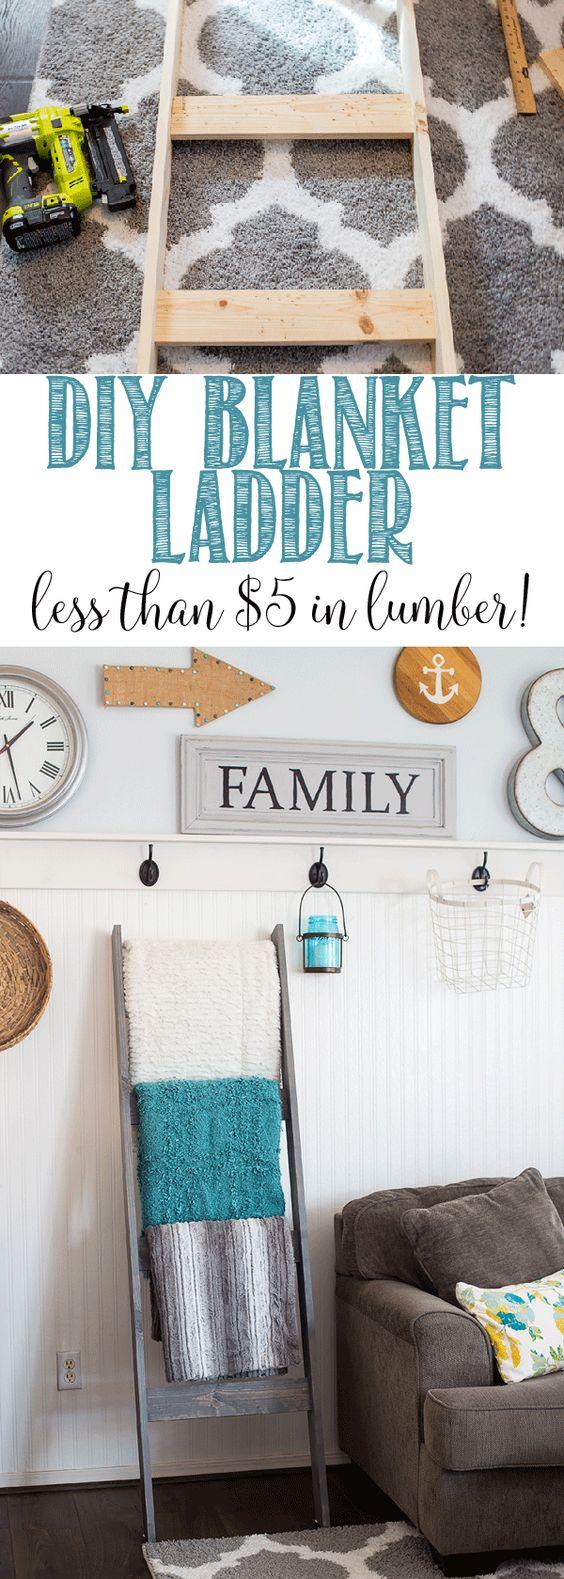 DIY Blanket Ladder for Less Than $5 in Lumber.